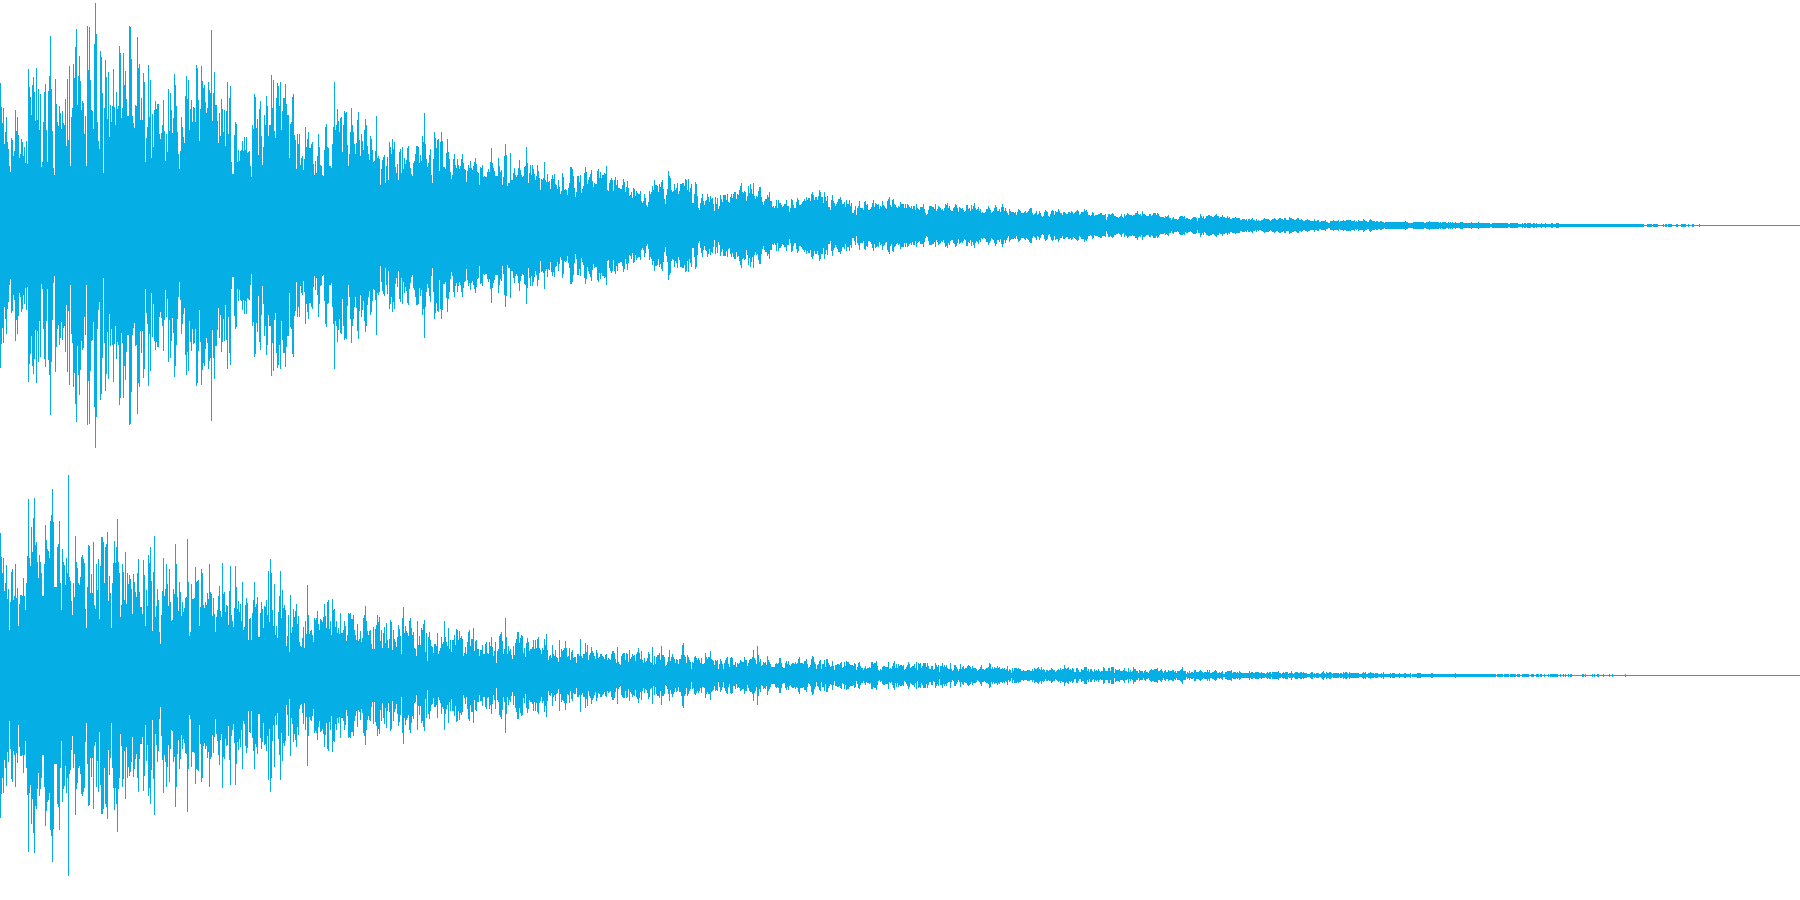 AnimeFX ゲゲゲな雰囲気の妖怪SEの再生済みの波形